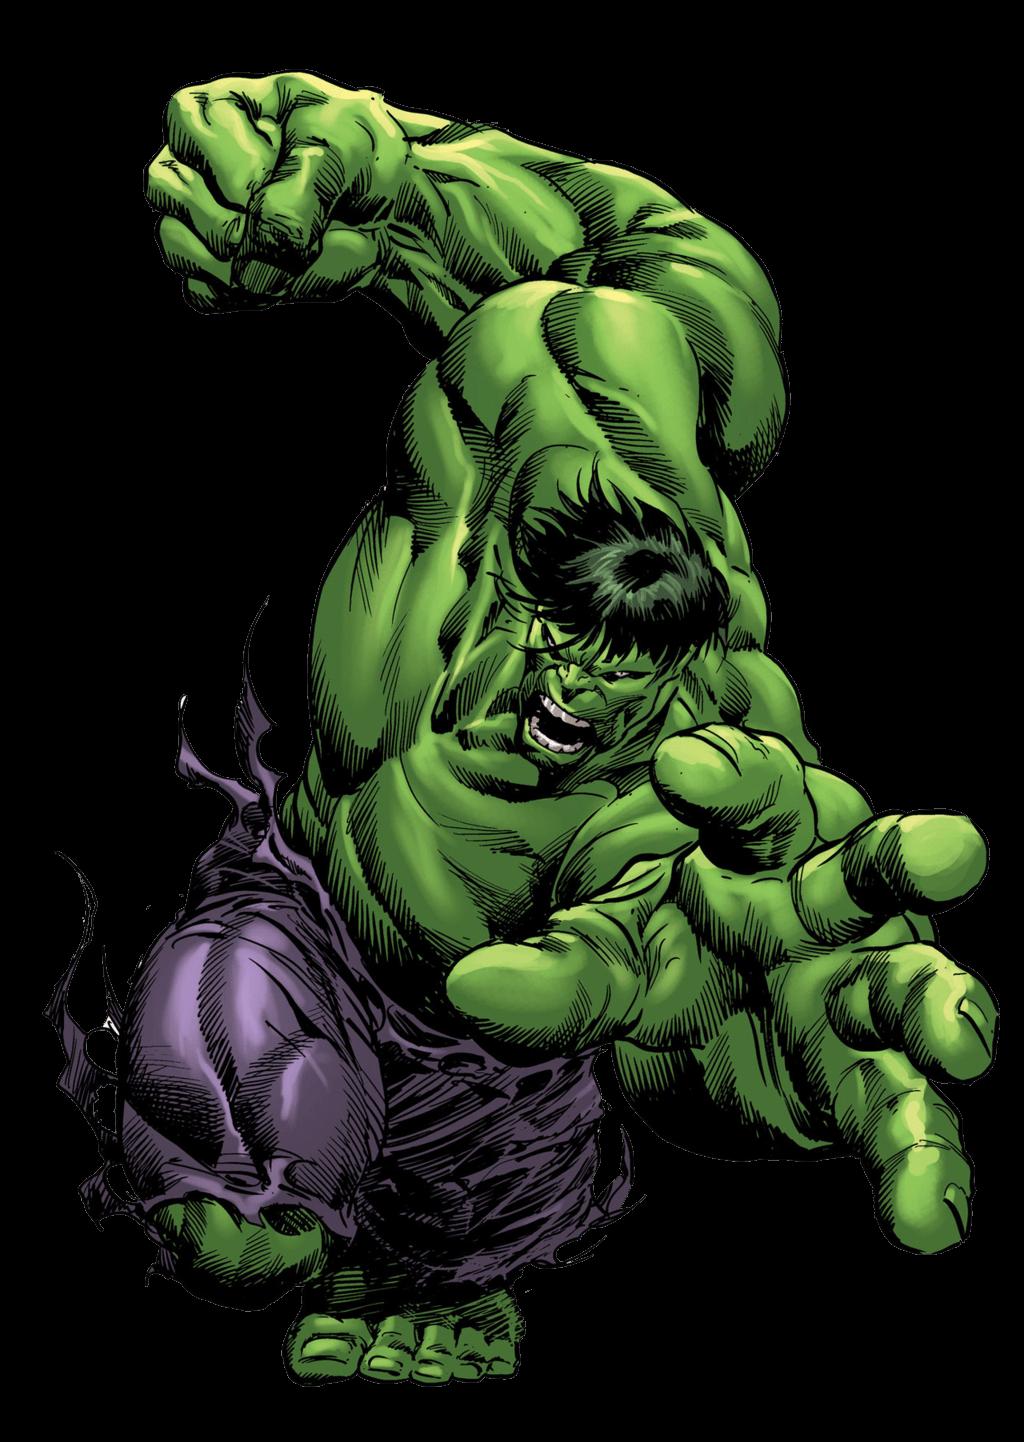 It is a photo of Gargantuan Incredible Hulk Clipart